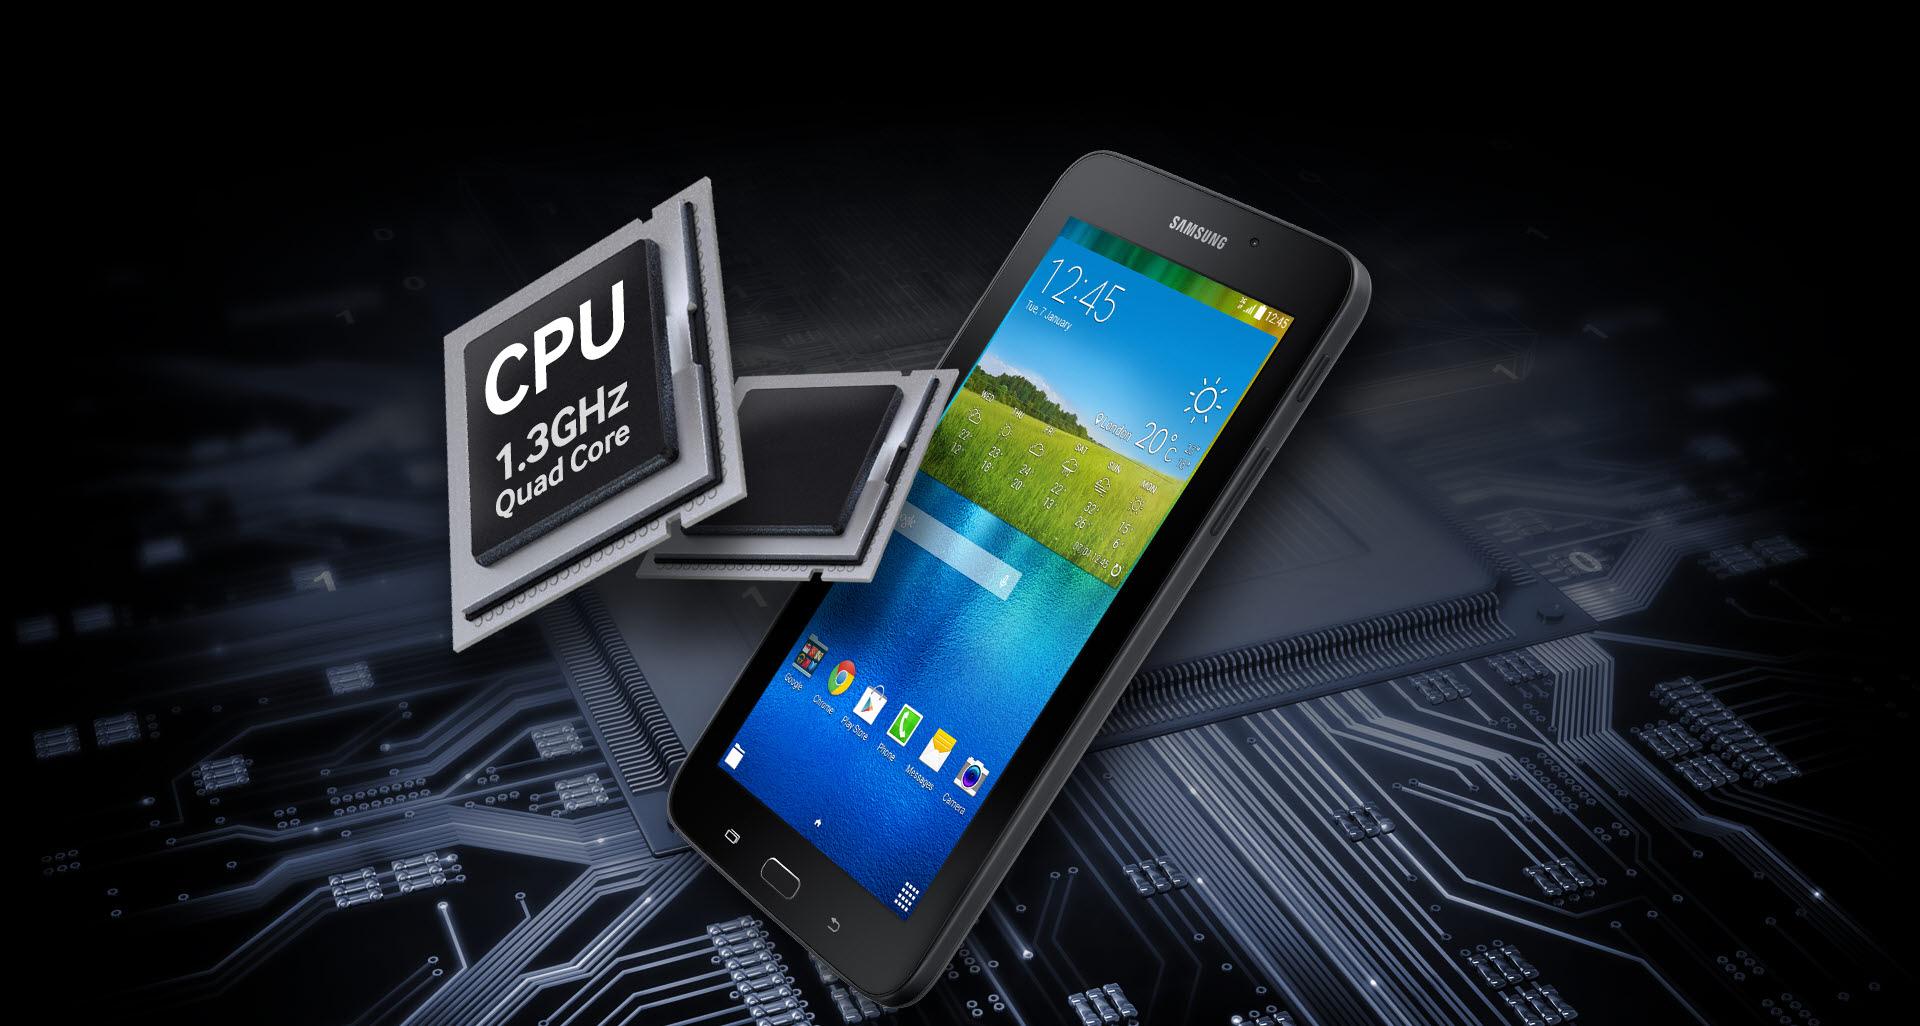 Samsung Galaxy Tab E 7.0 processor